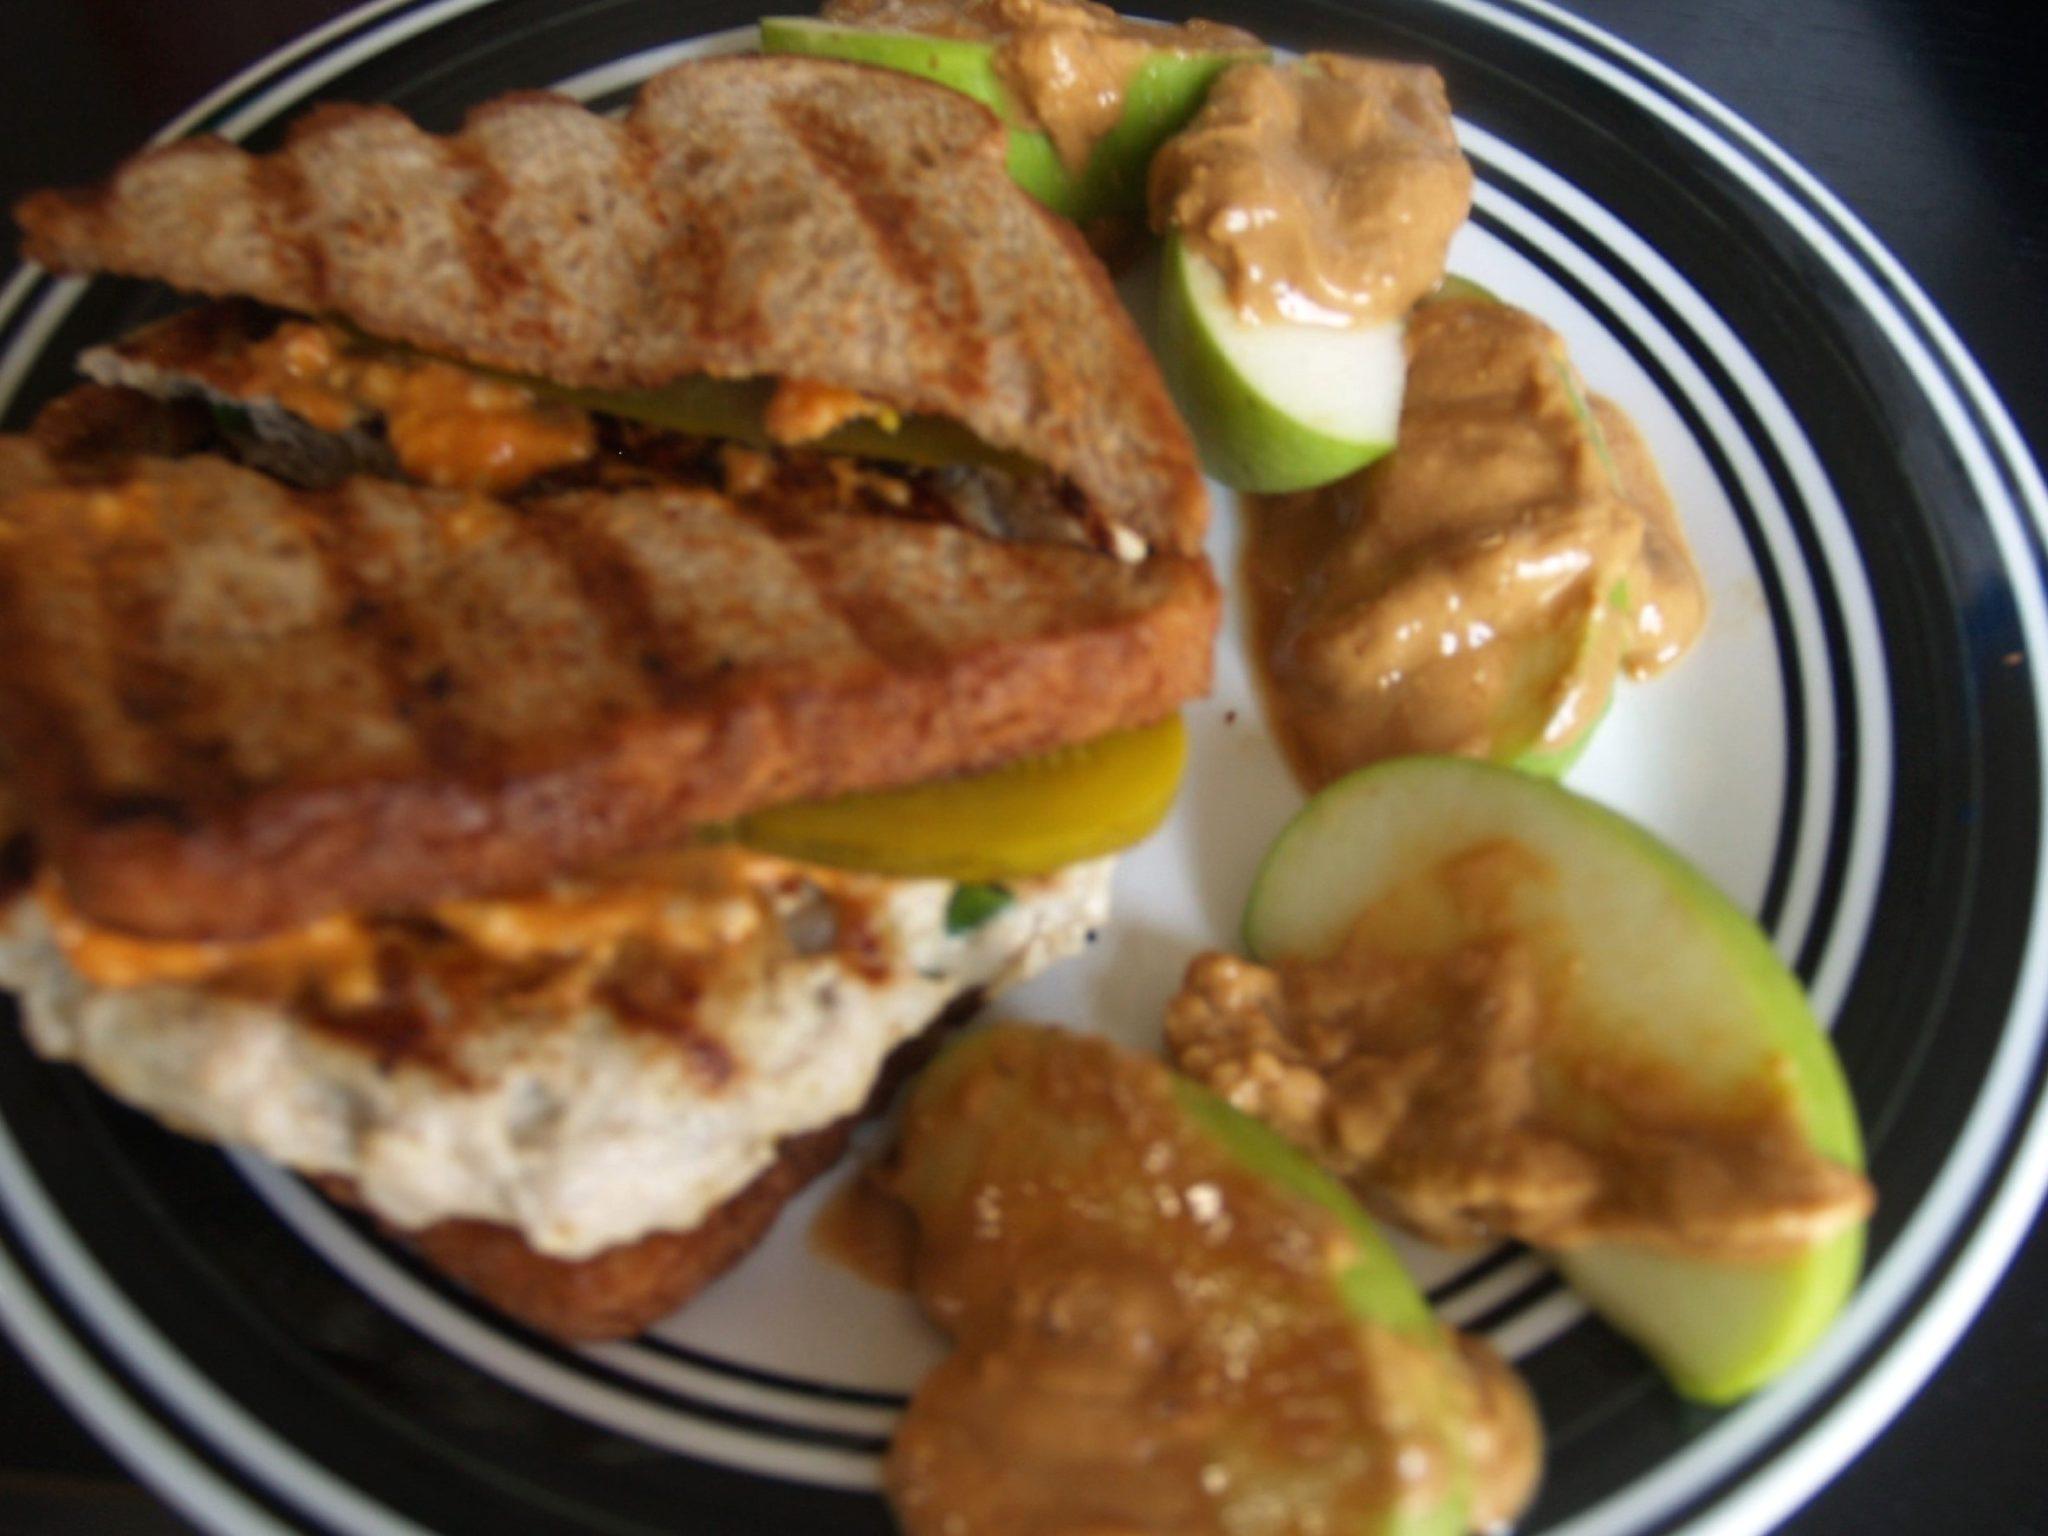 Green Curry Turkey Burger (เบอร์เกอร์พริกแกงเขียวหวานเนื้อไก่งวง